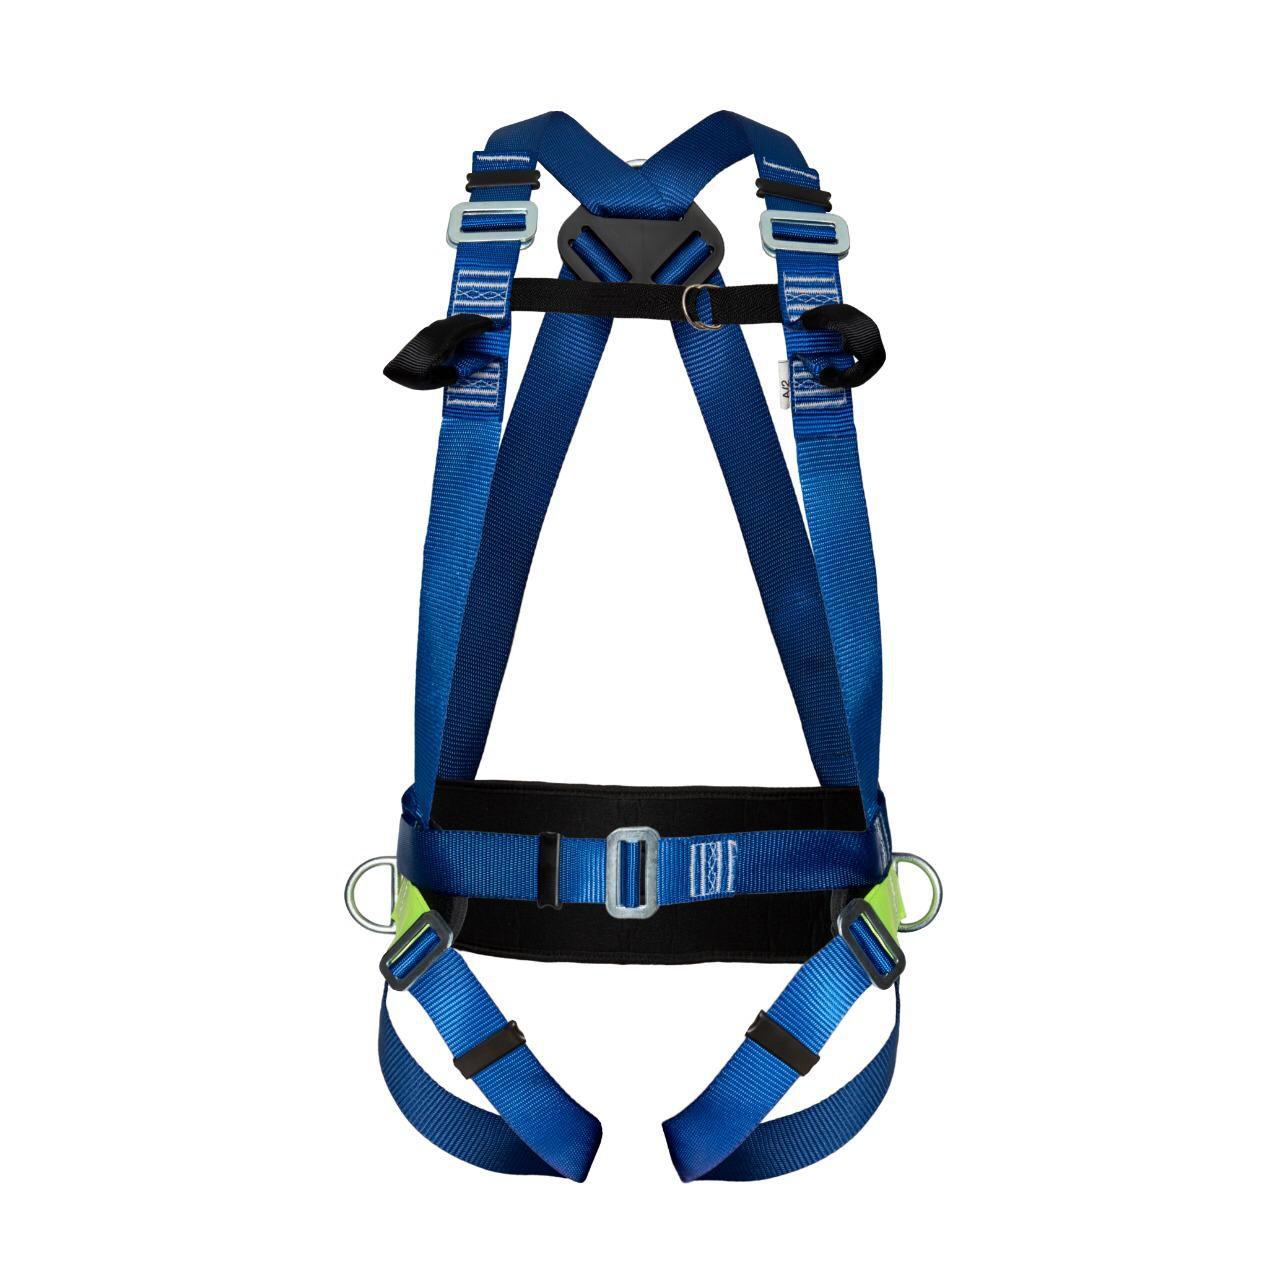 Cinturão Paraquedista 4 Ponto de Ancoragem Com Talabarte Y 55 ABS